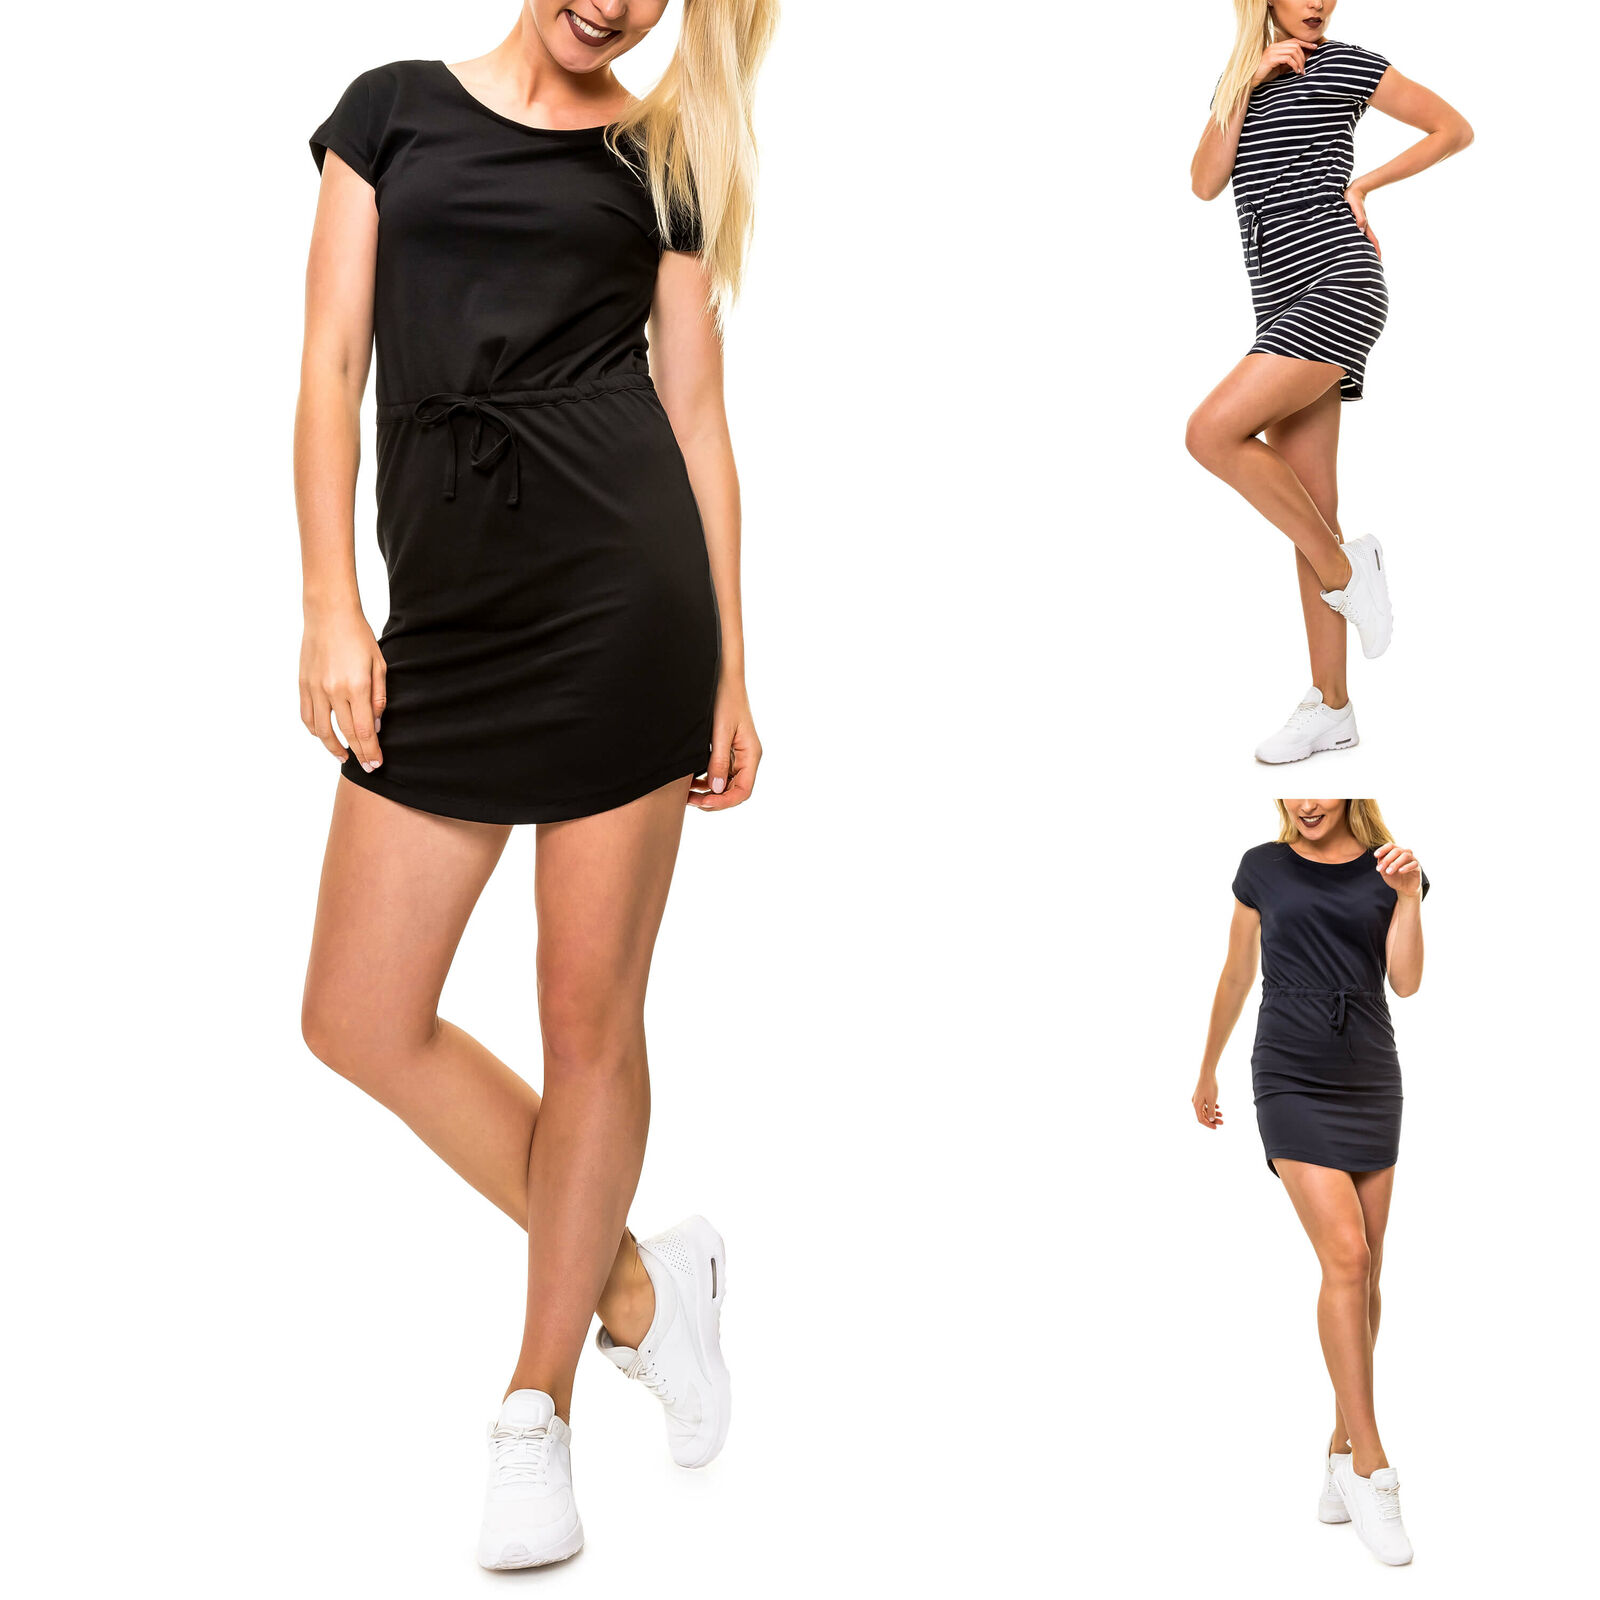 Only Damen Jersey Sommer Kleid Strandkleid Stretchkleid Shirtkleid Kurzarmkleid